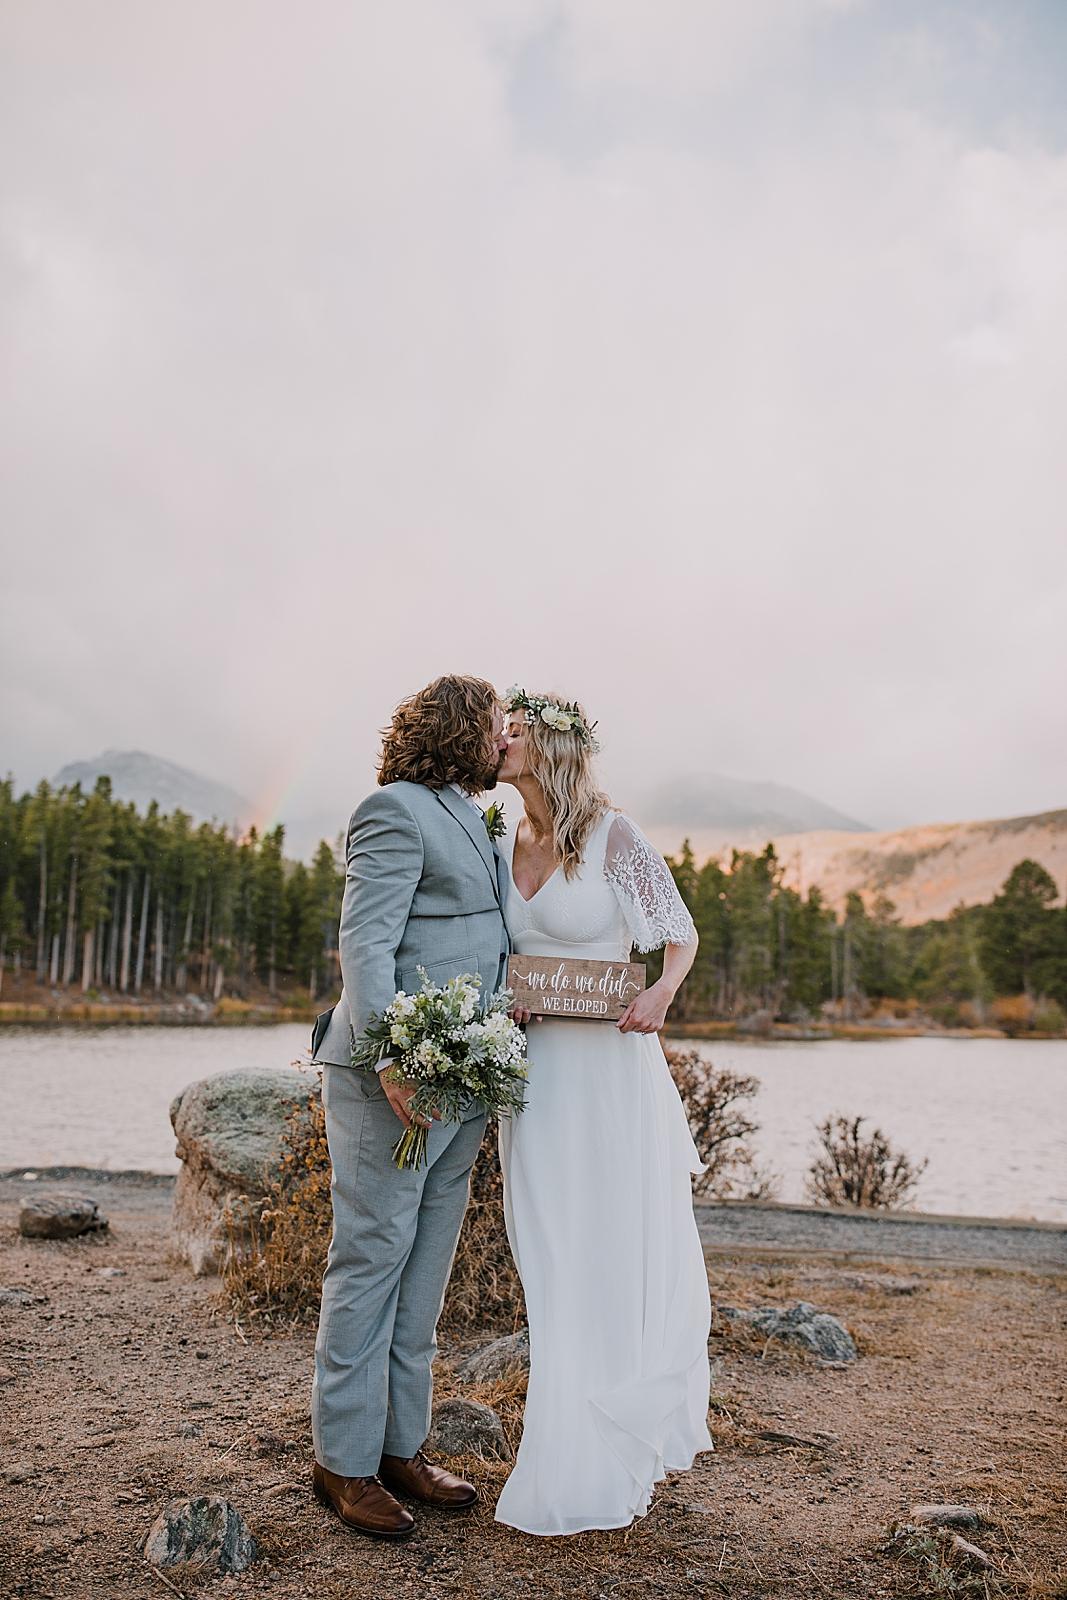 elopement sign, sprague lake dock elopement, sunrise elopement, colorado elopement, sprague lake elopement, rocky mountain national park elopement, adventurous colorado hiking elopement